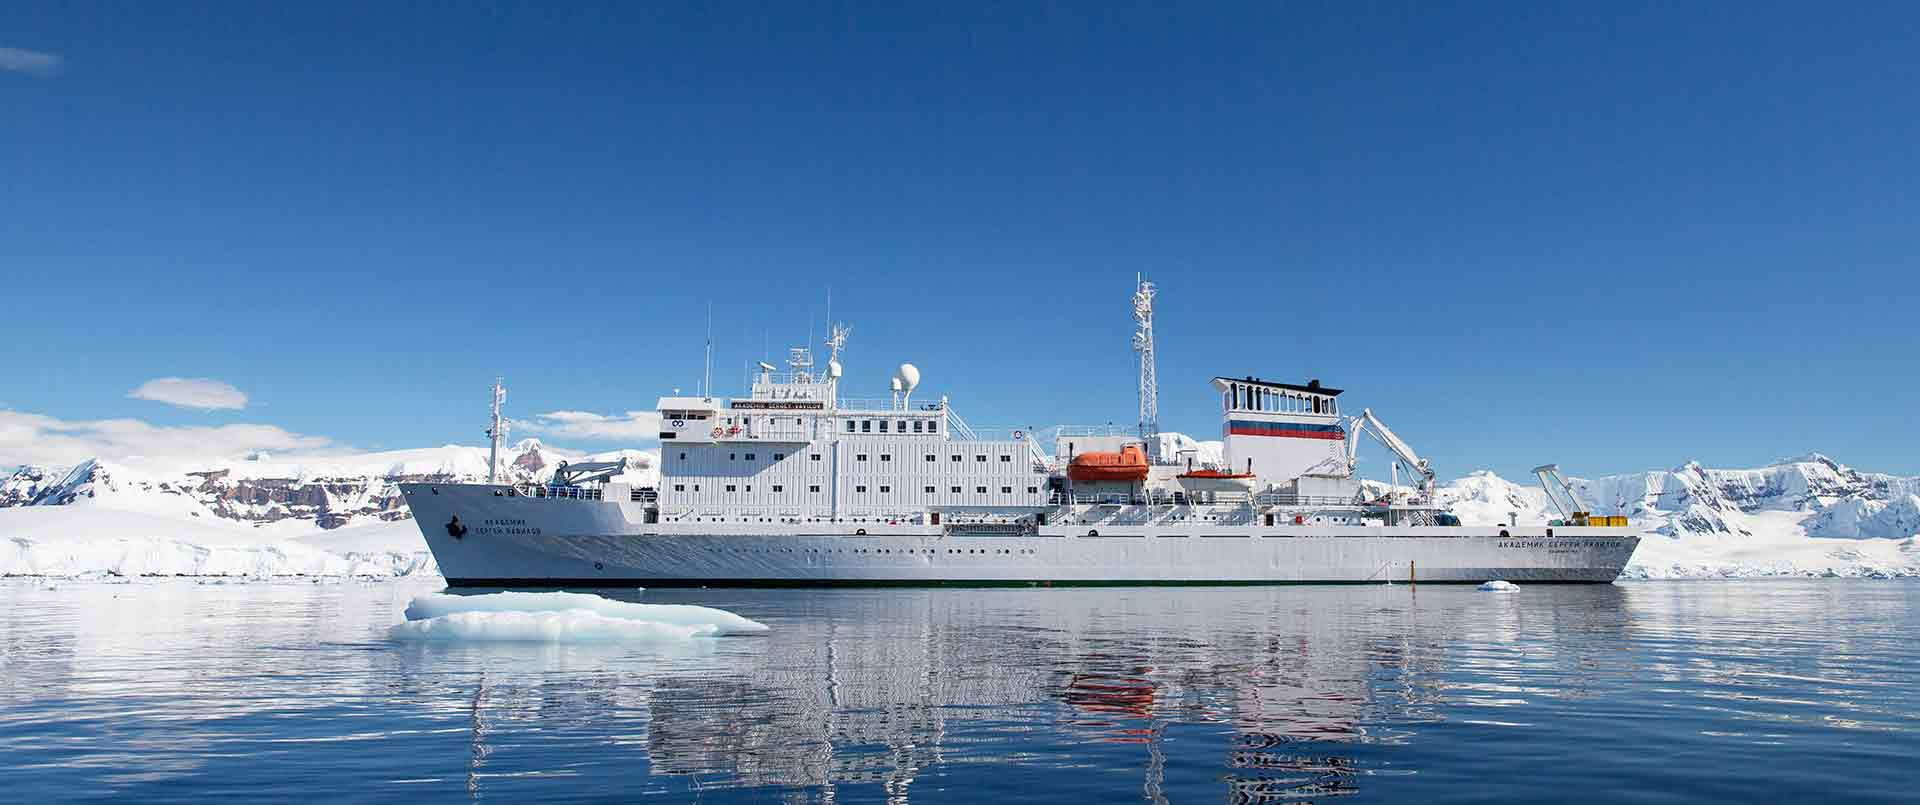 Save £500: Christmas aboard Akademik Sergey Vavilov